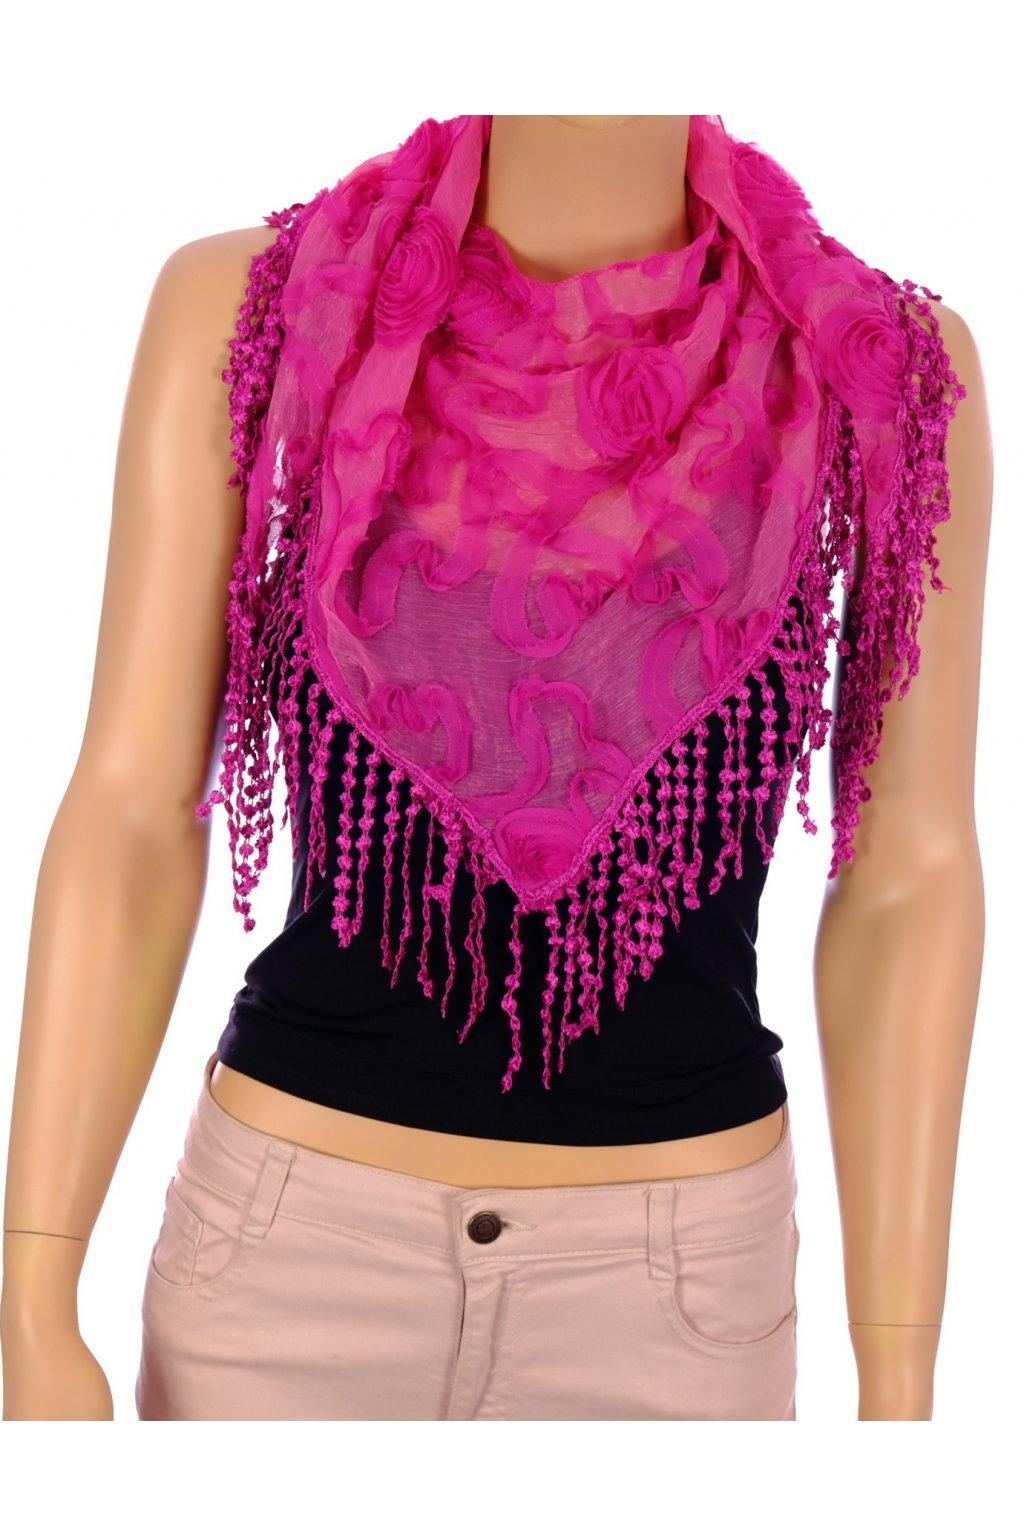 Šátek růžový s plastickými růžičkami